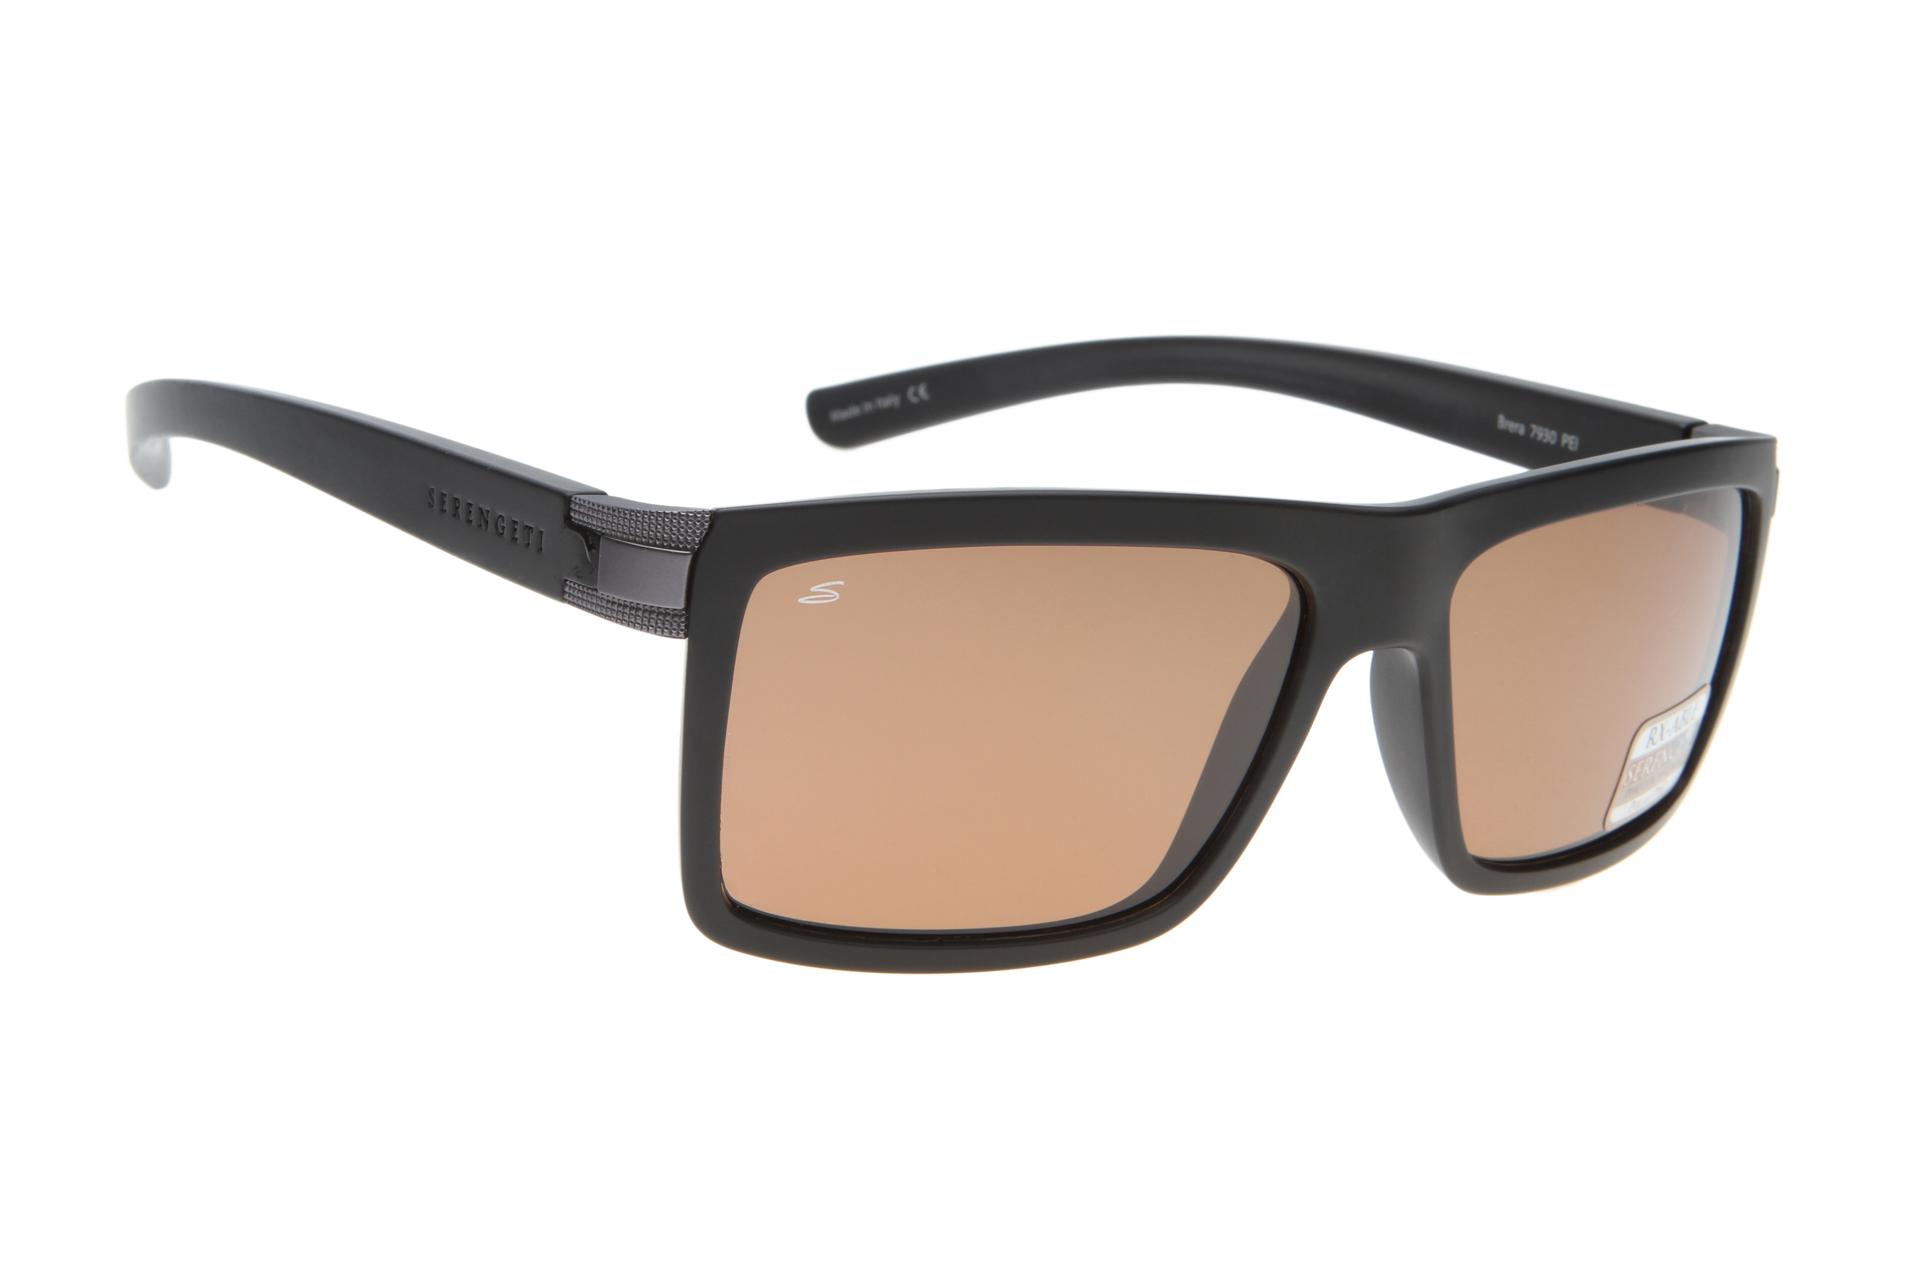 8582addfe8cdc1 Serengeti Brera 7930 (Sanded Reg Black) Gepolariseerd zonnebril